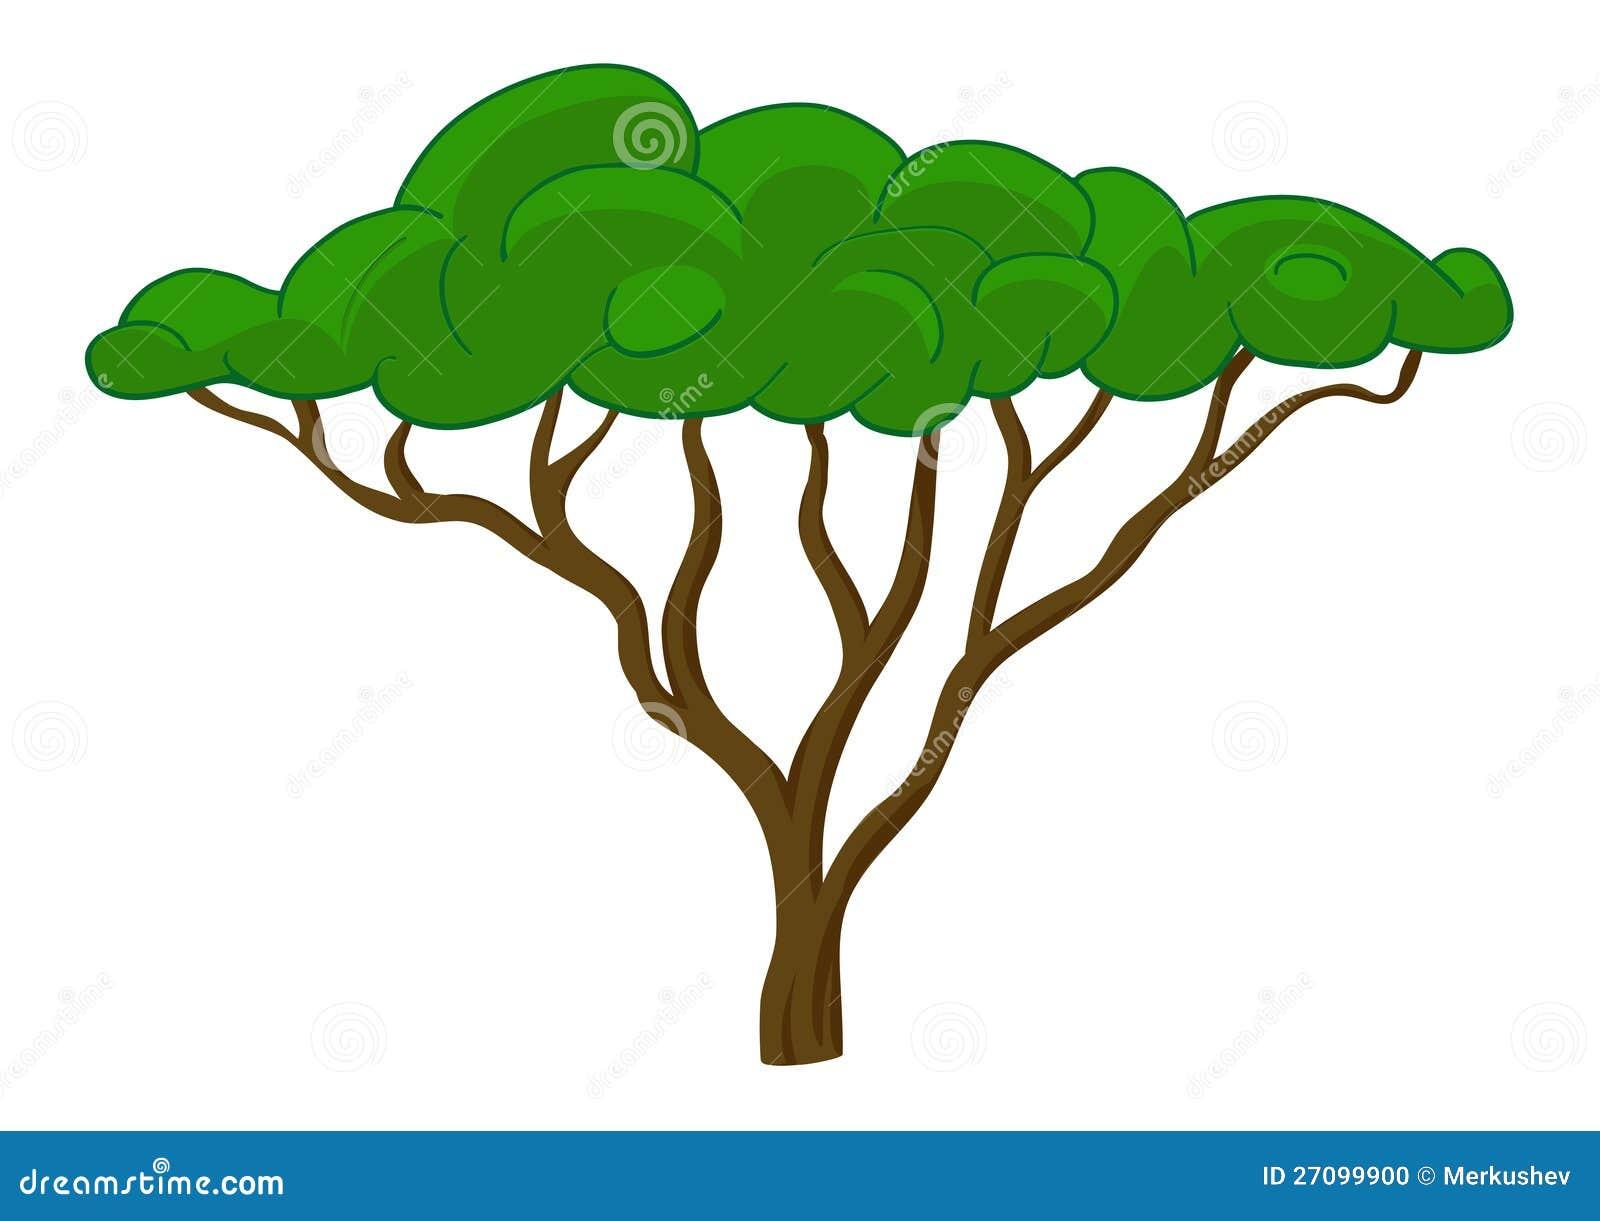 Clip Art African Tree Modern doodle zentangle contour illustration black. global perspectivess